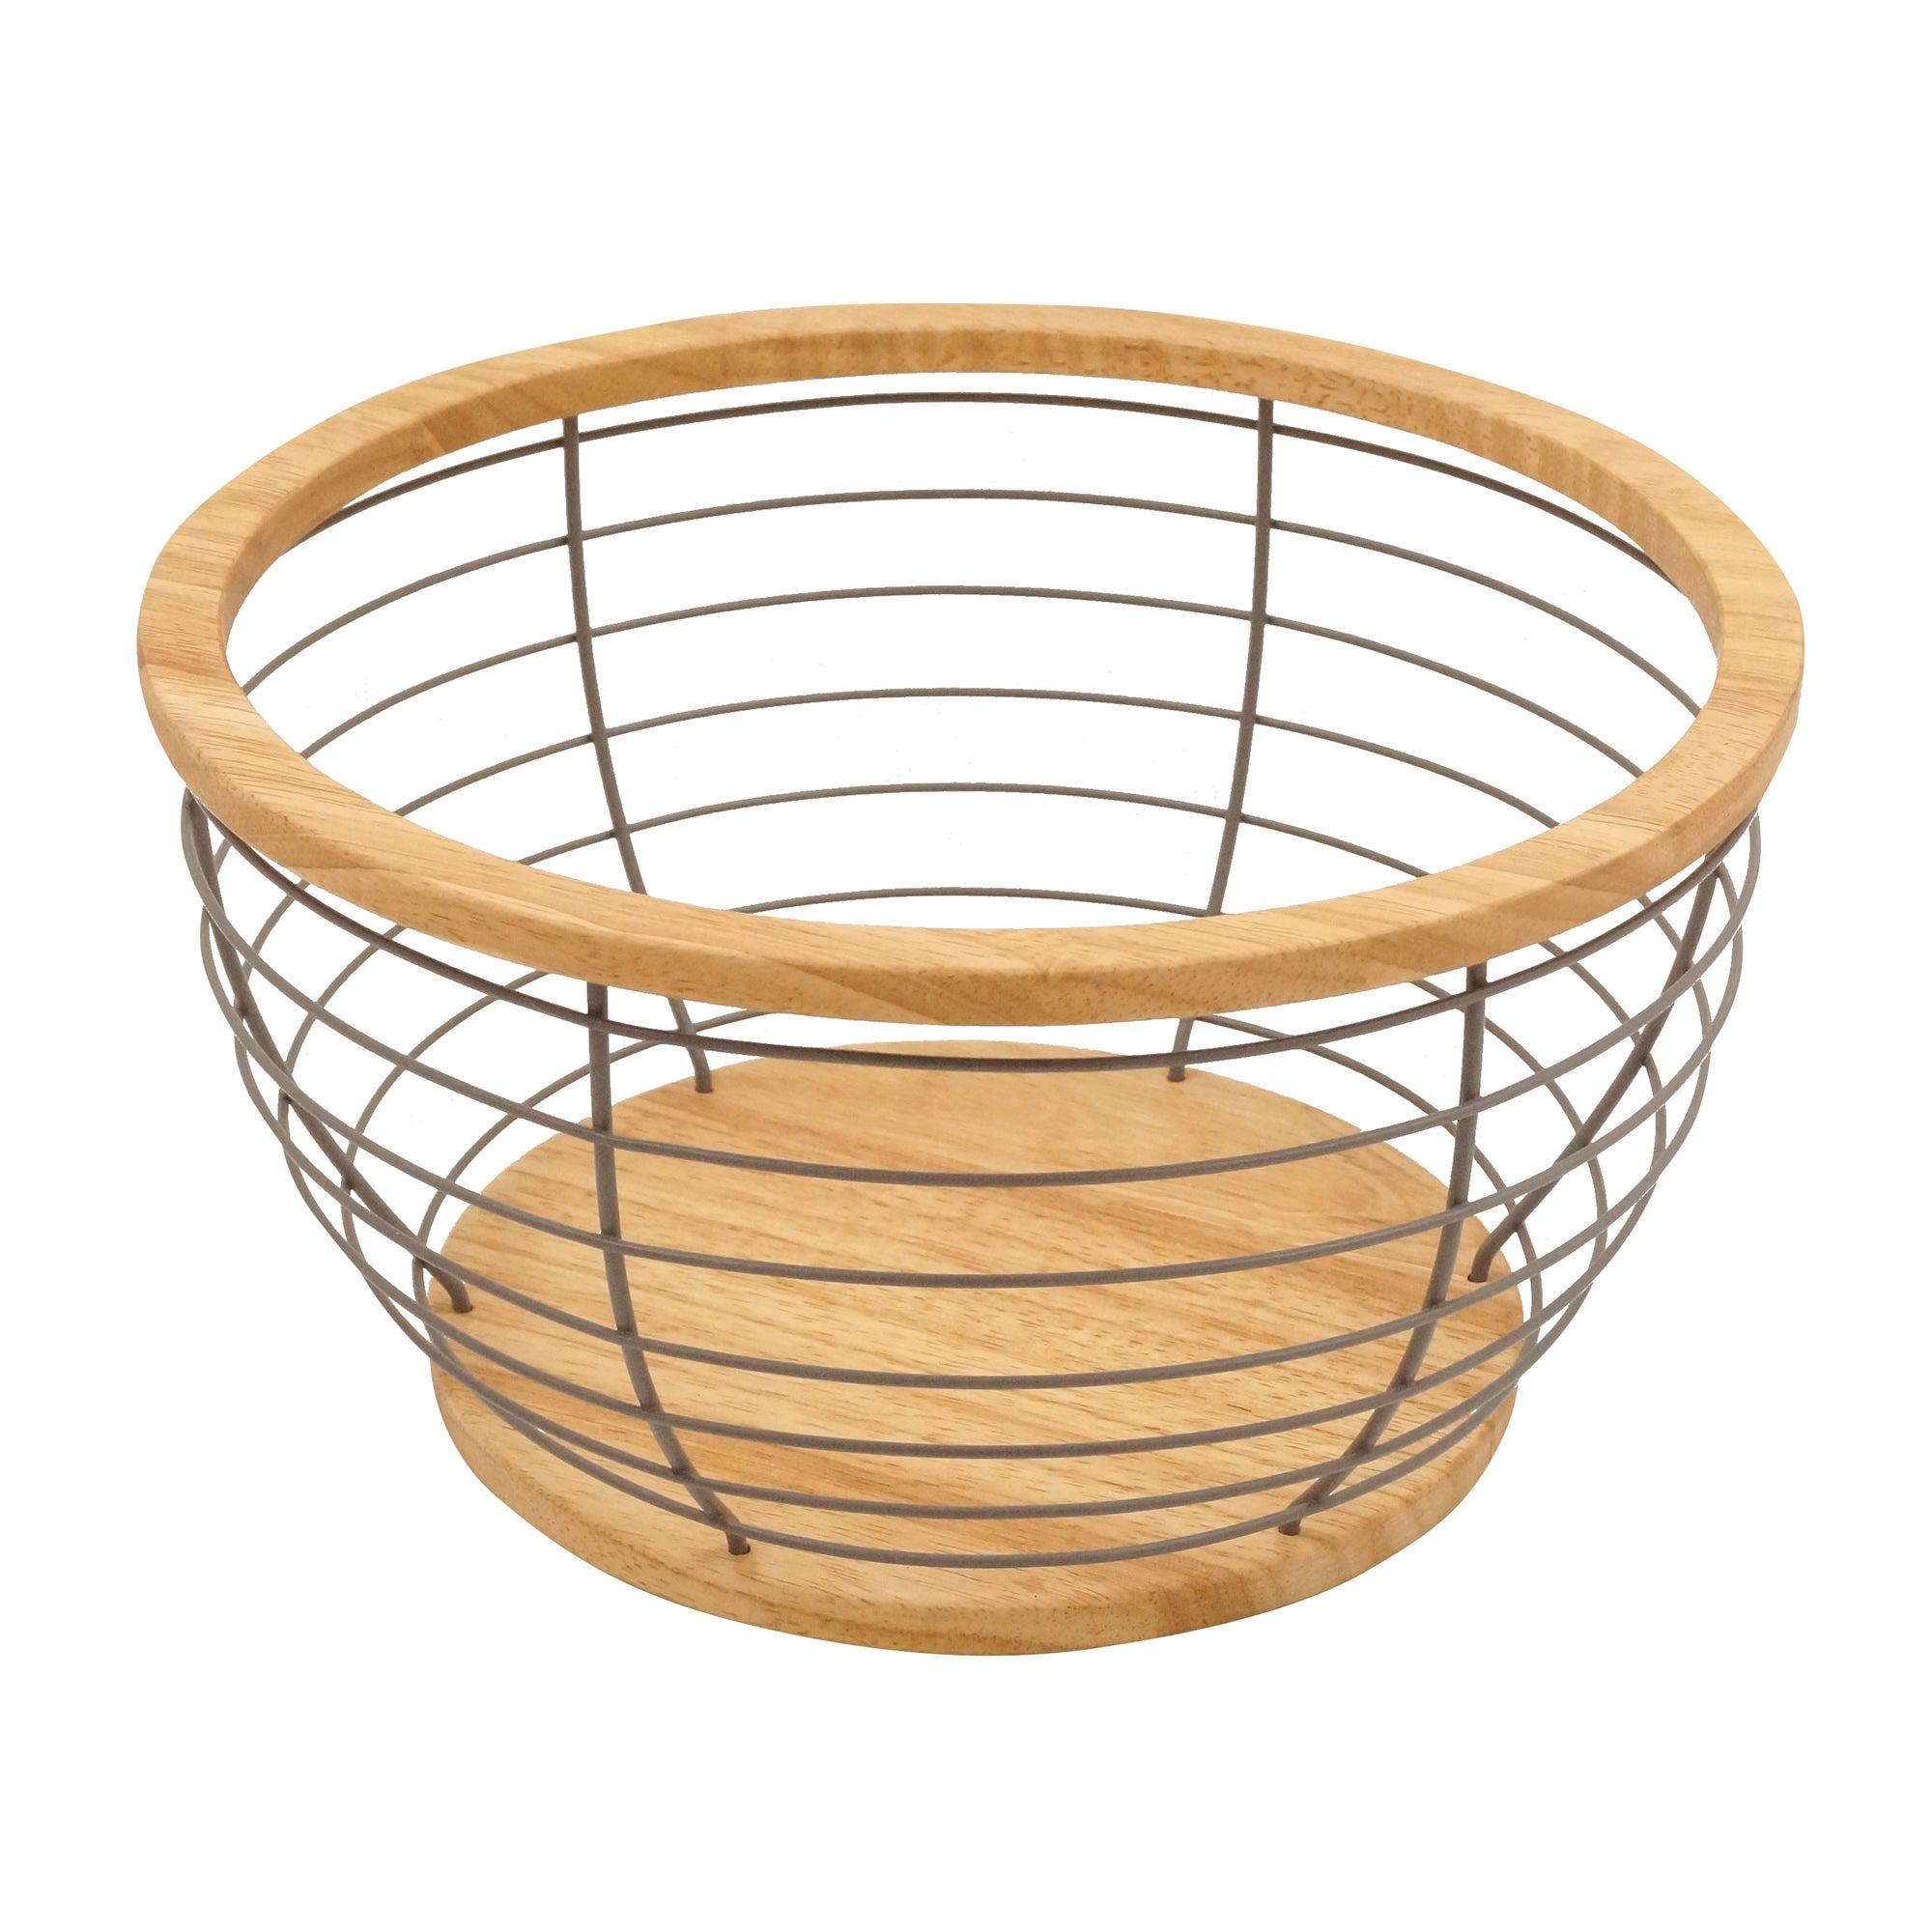 Wooden Fruit Bowl Brown